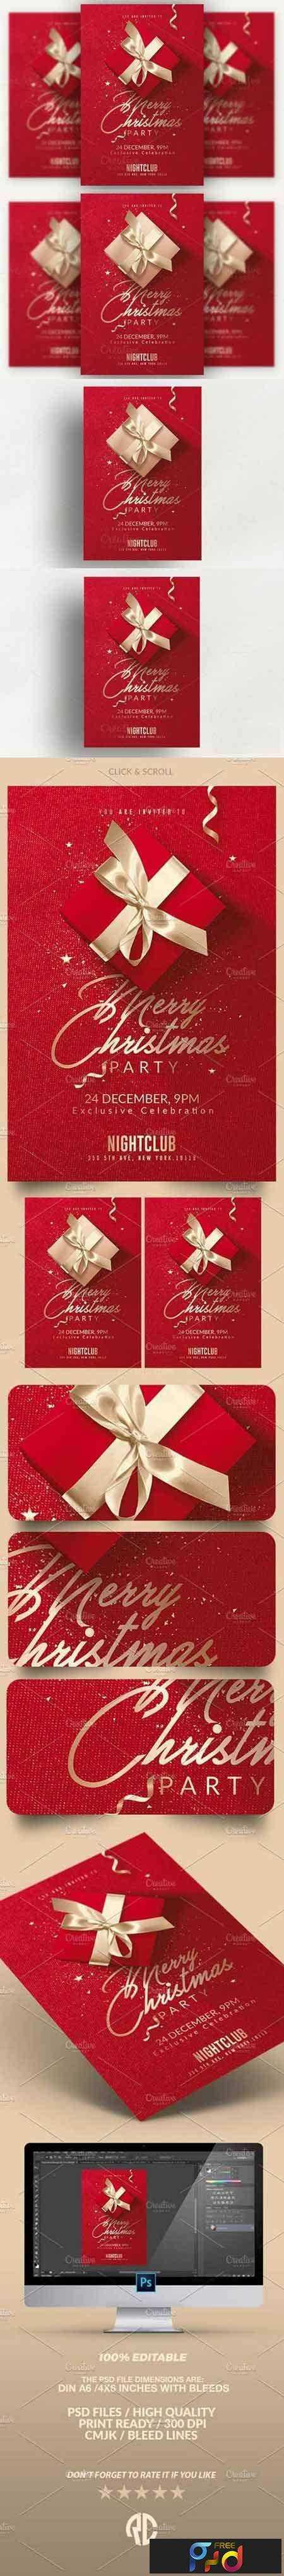 freepsdvn-com_1480554816_red-christmas-invitation-flyer-1049634